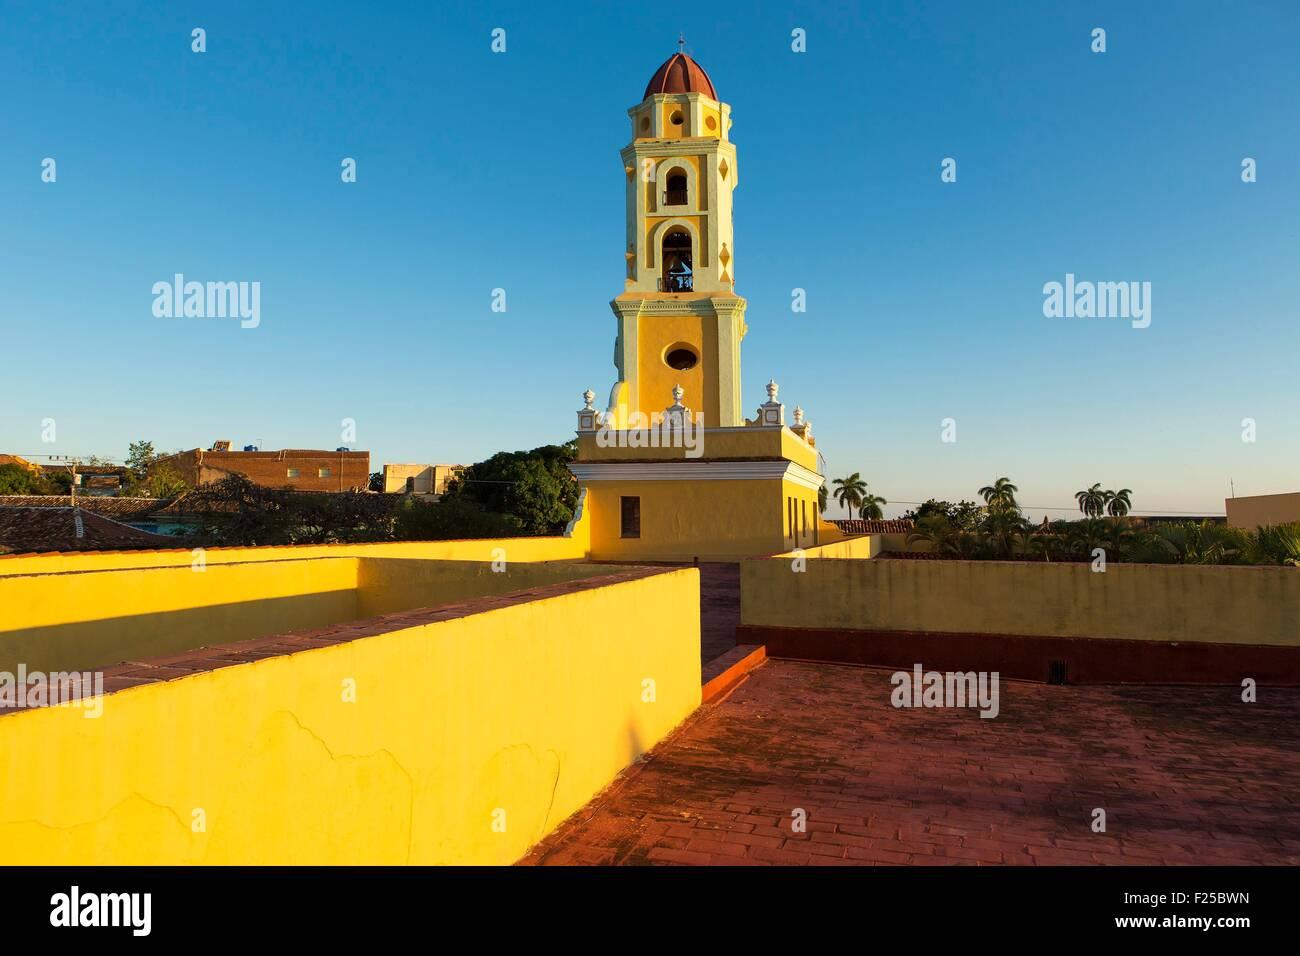 Cuba, Sancti Spiritus Provincia, Trinidad de Cuba elencati come patrimonio mondiale dall' UNESCO, San Francisco Immagini Stock